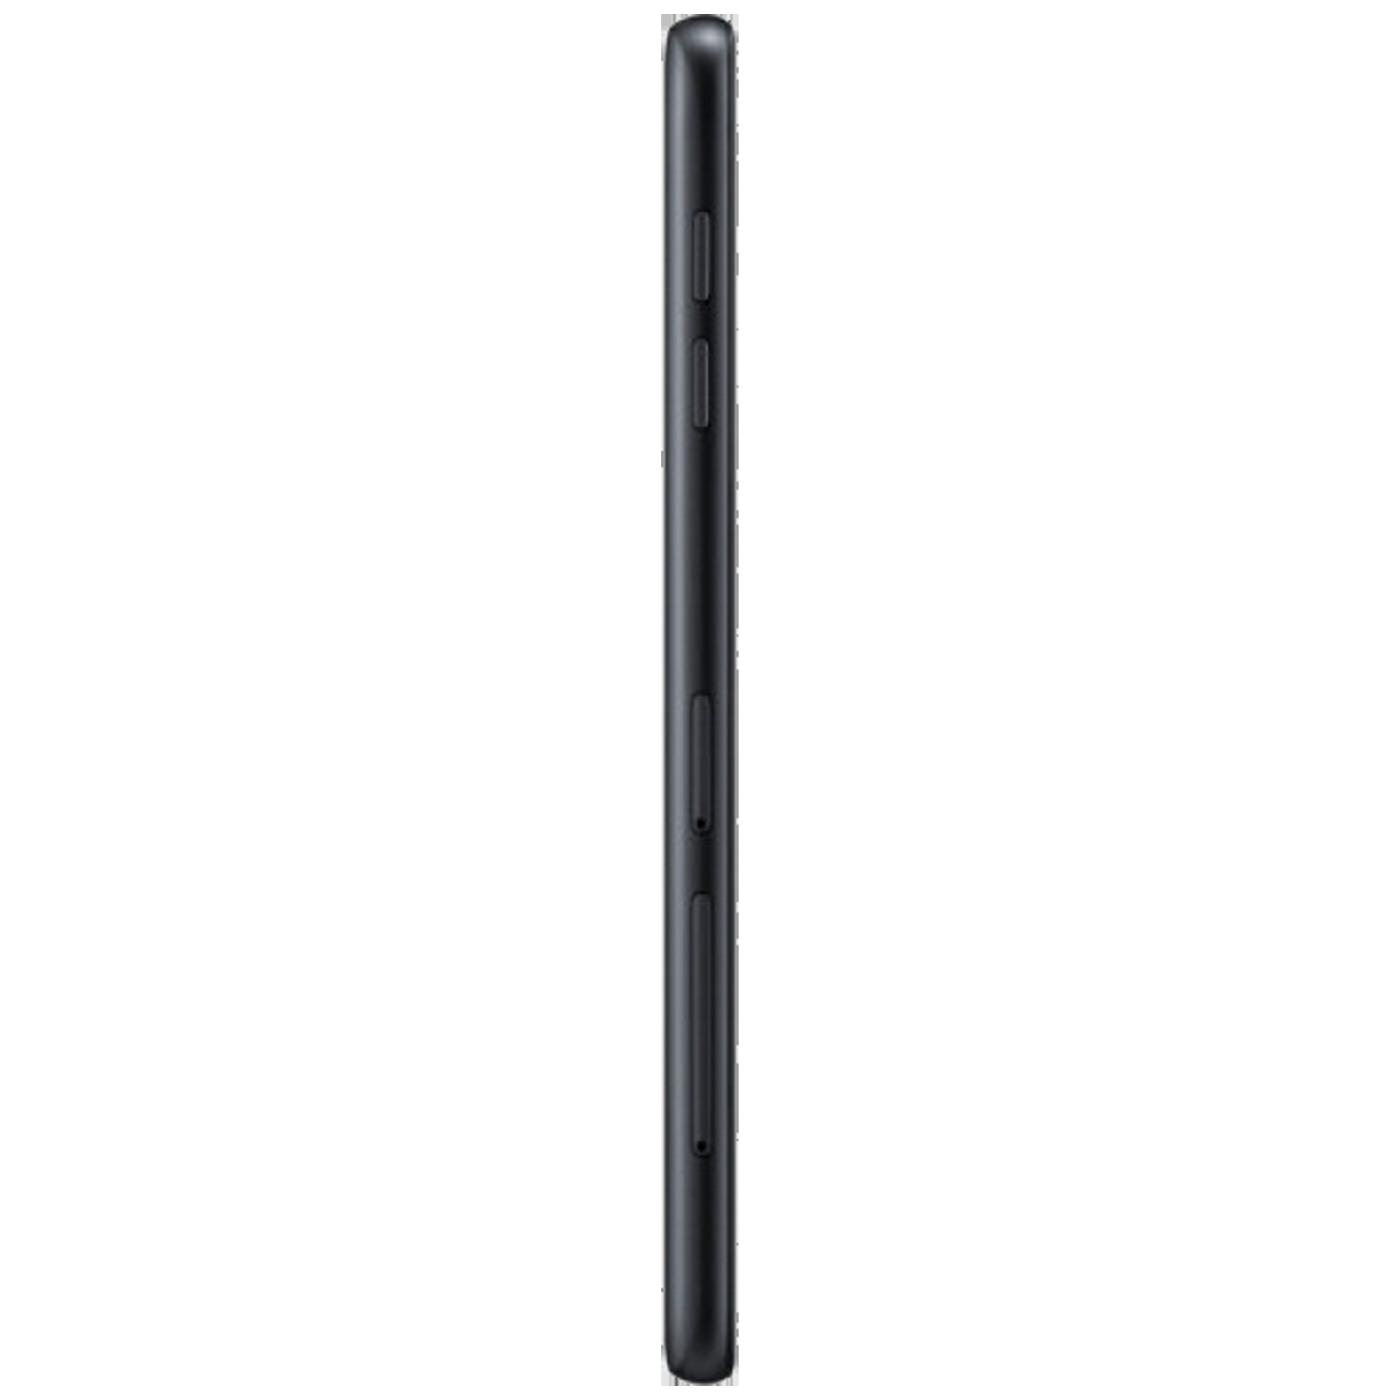 Galaxy J7 (2017) Black